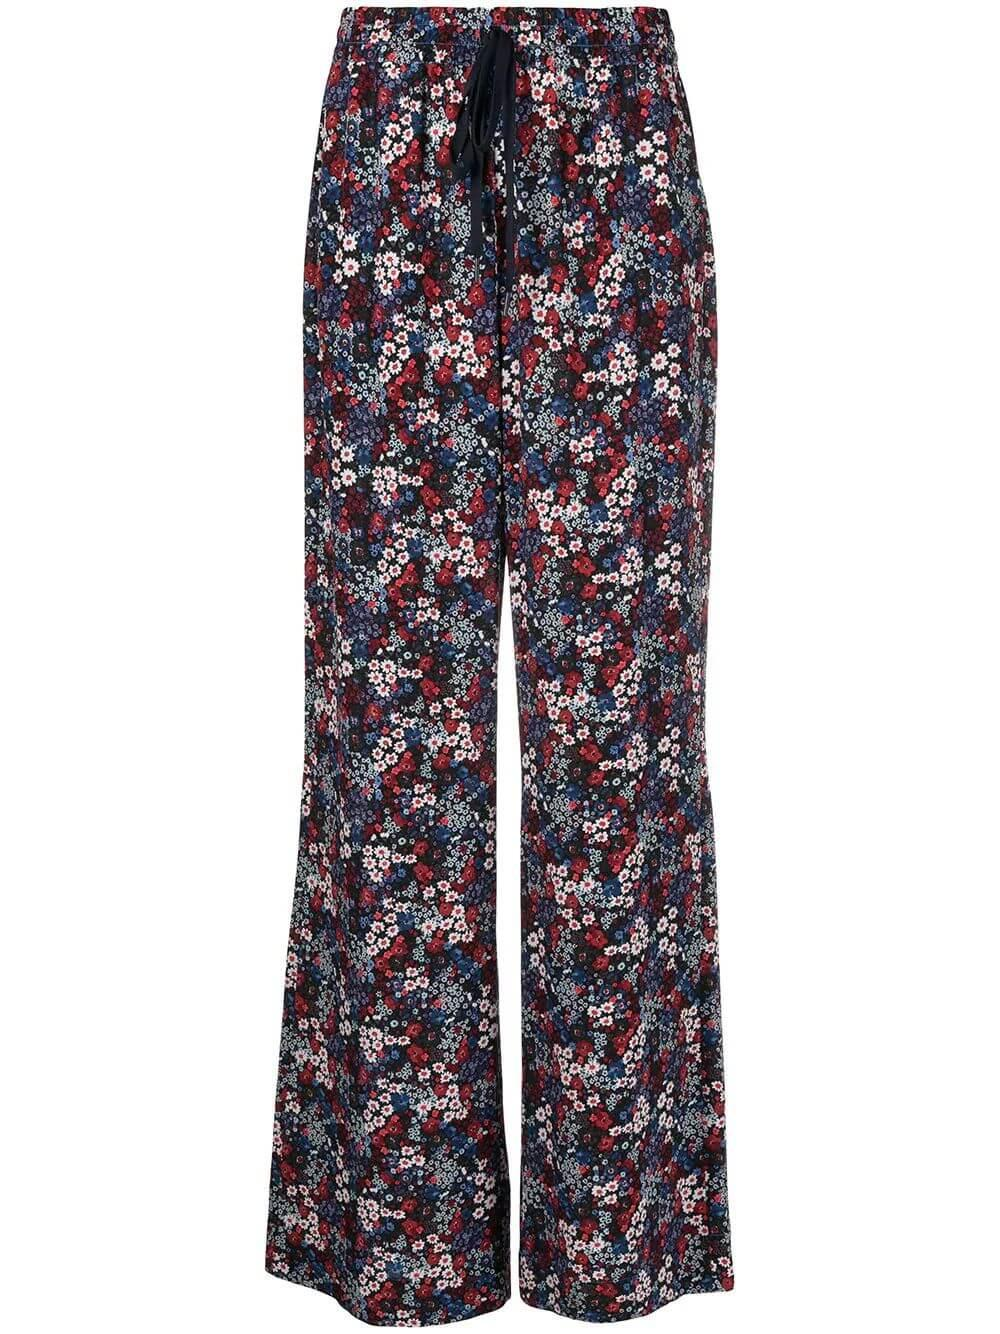 Floral Print Wide Leg Pants Item # CHS21SPA07027